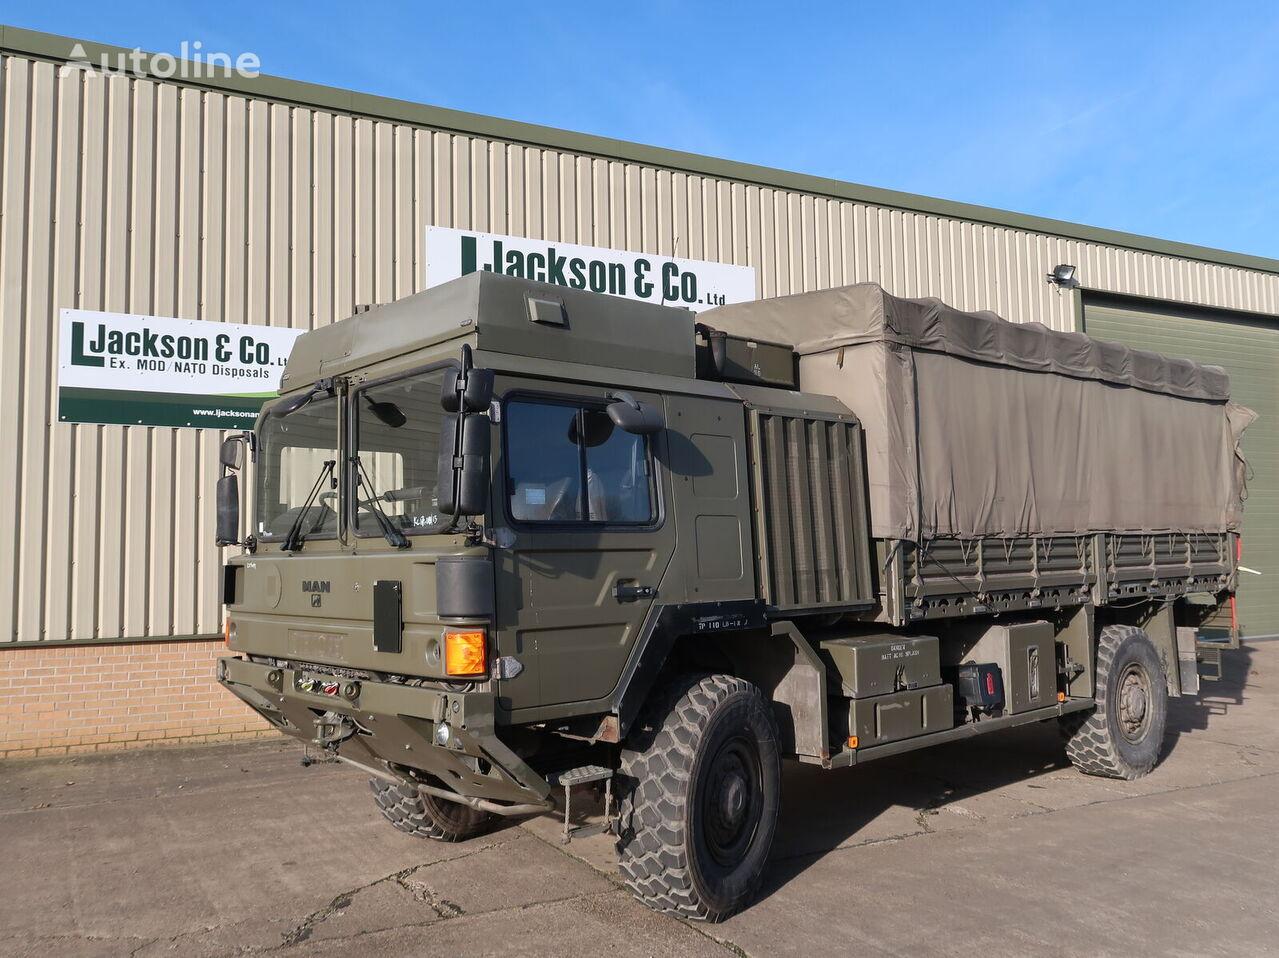 кунг MAN HX60 18.330 4x4 Army Truck